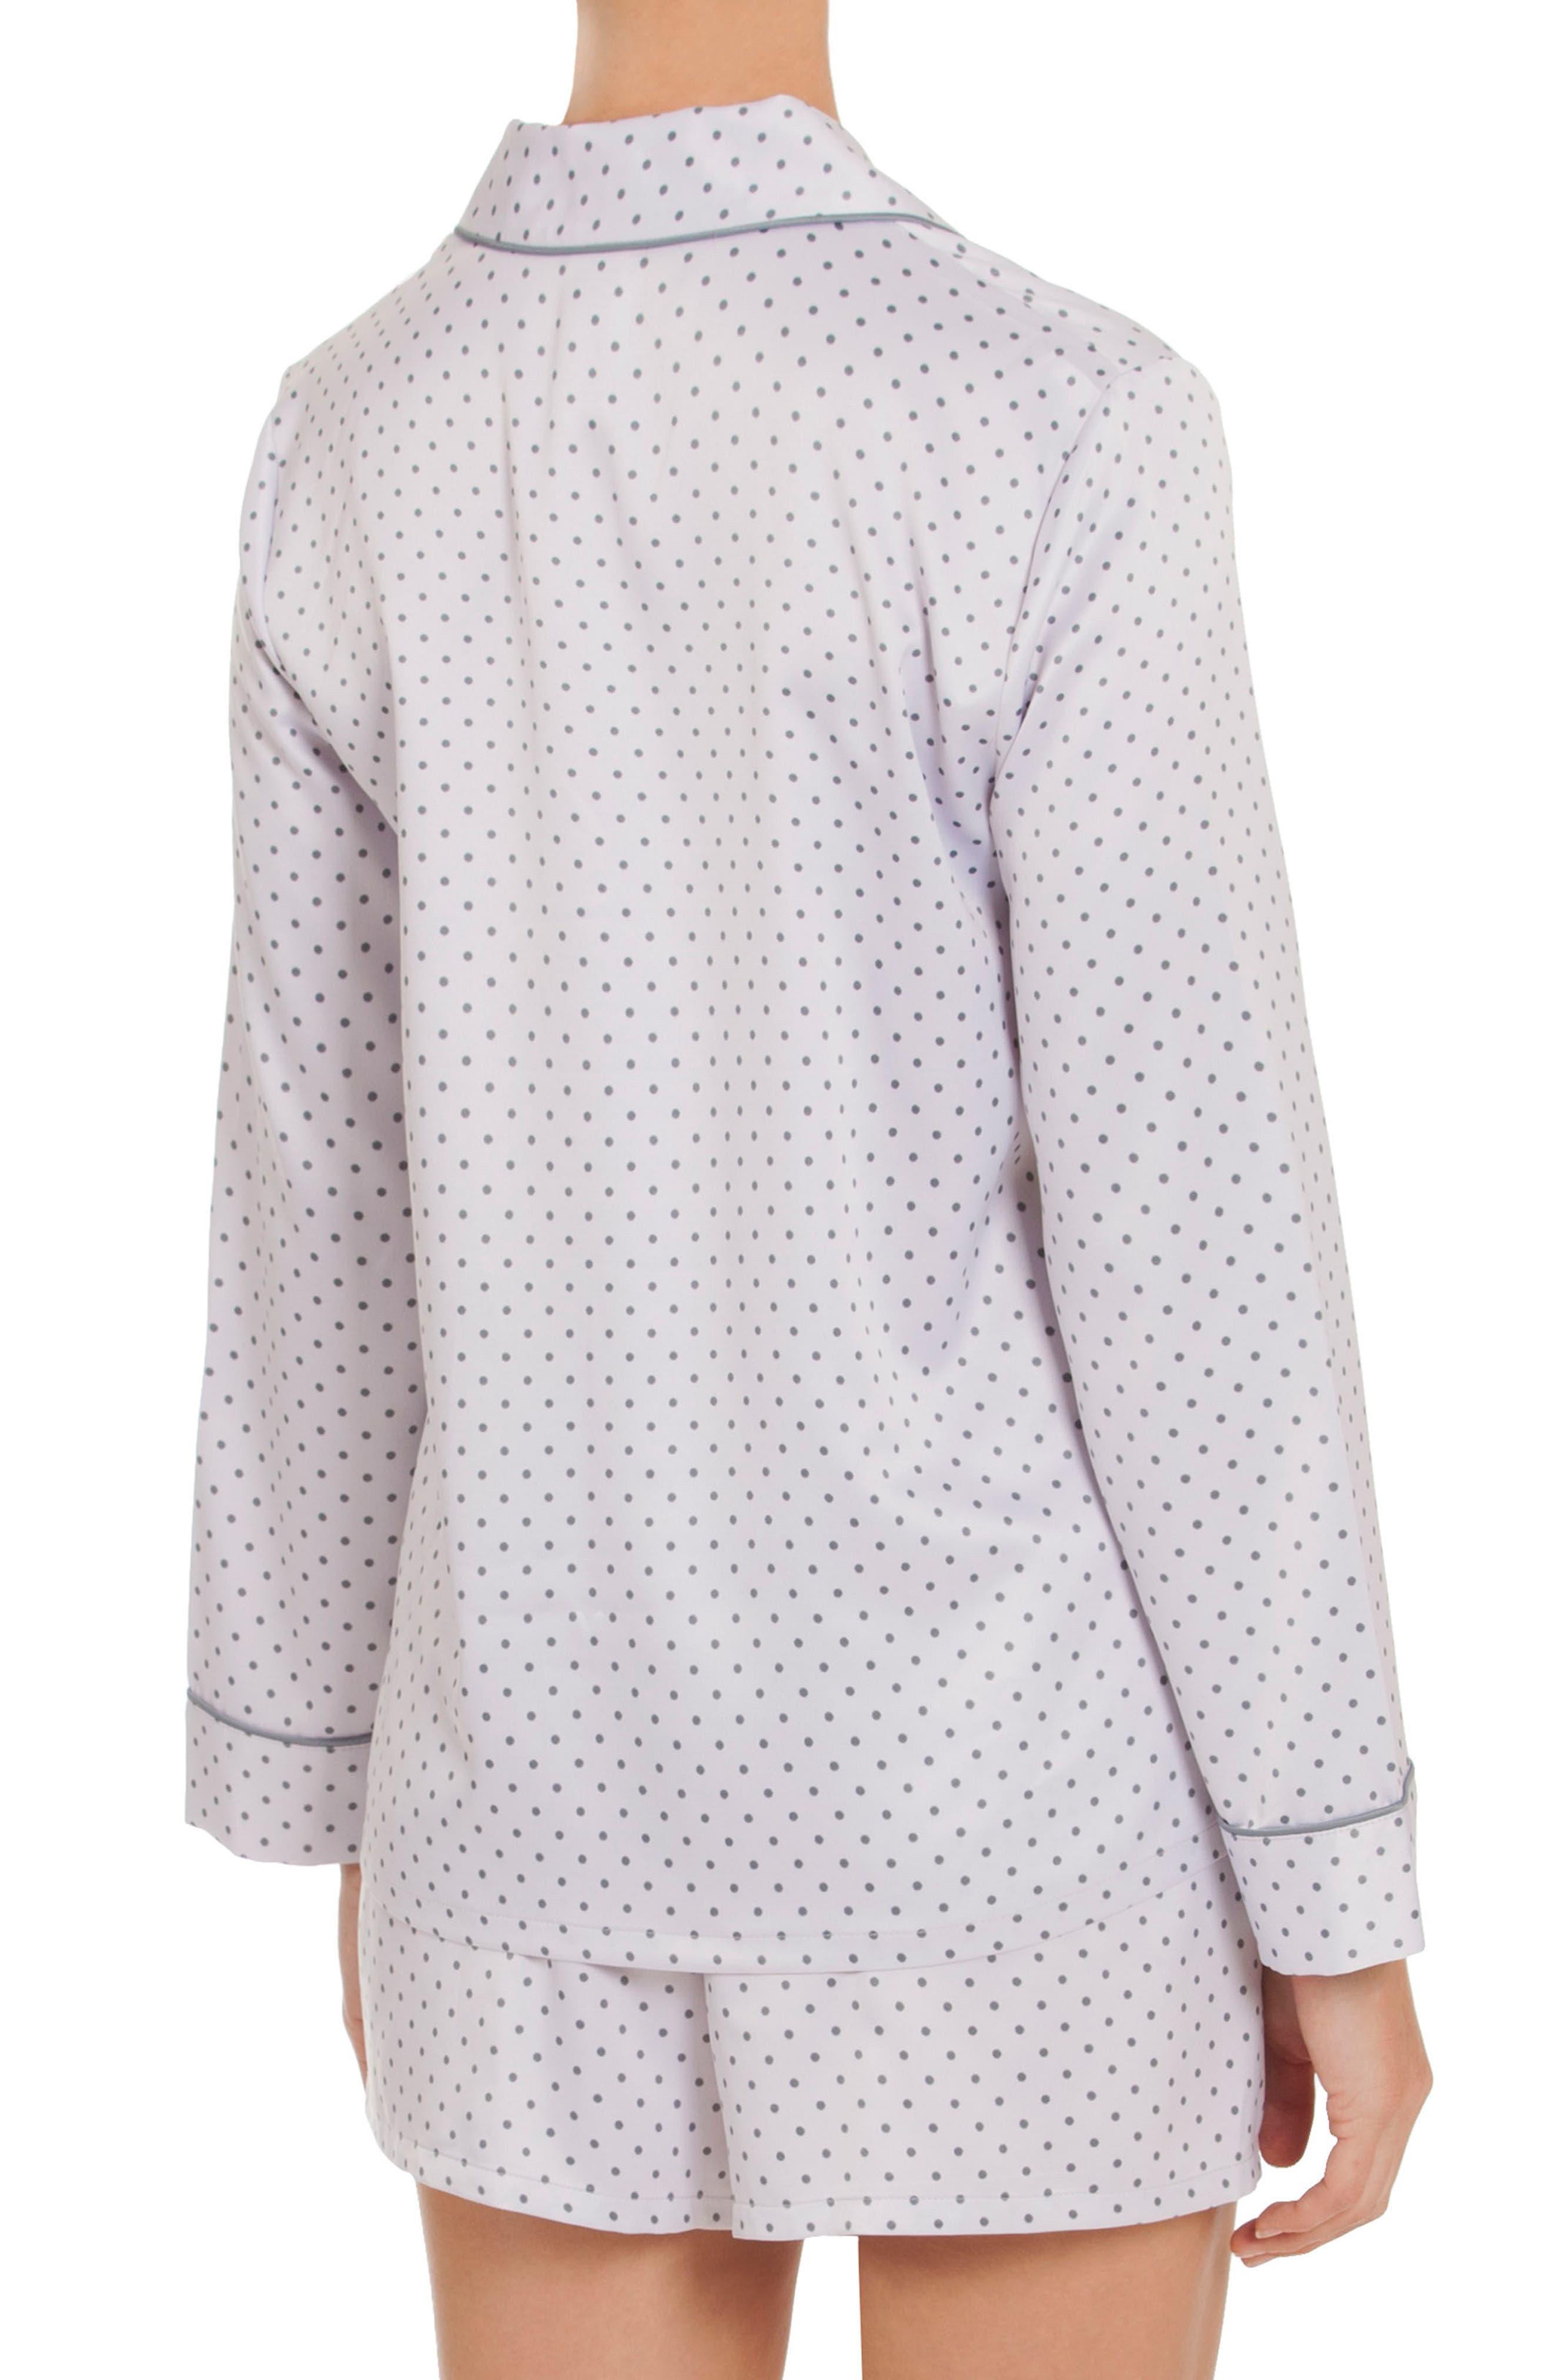 Short Pajamas,                             Alternate thumbnail 3, color,                             020